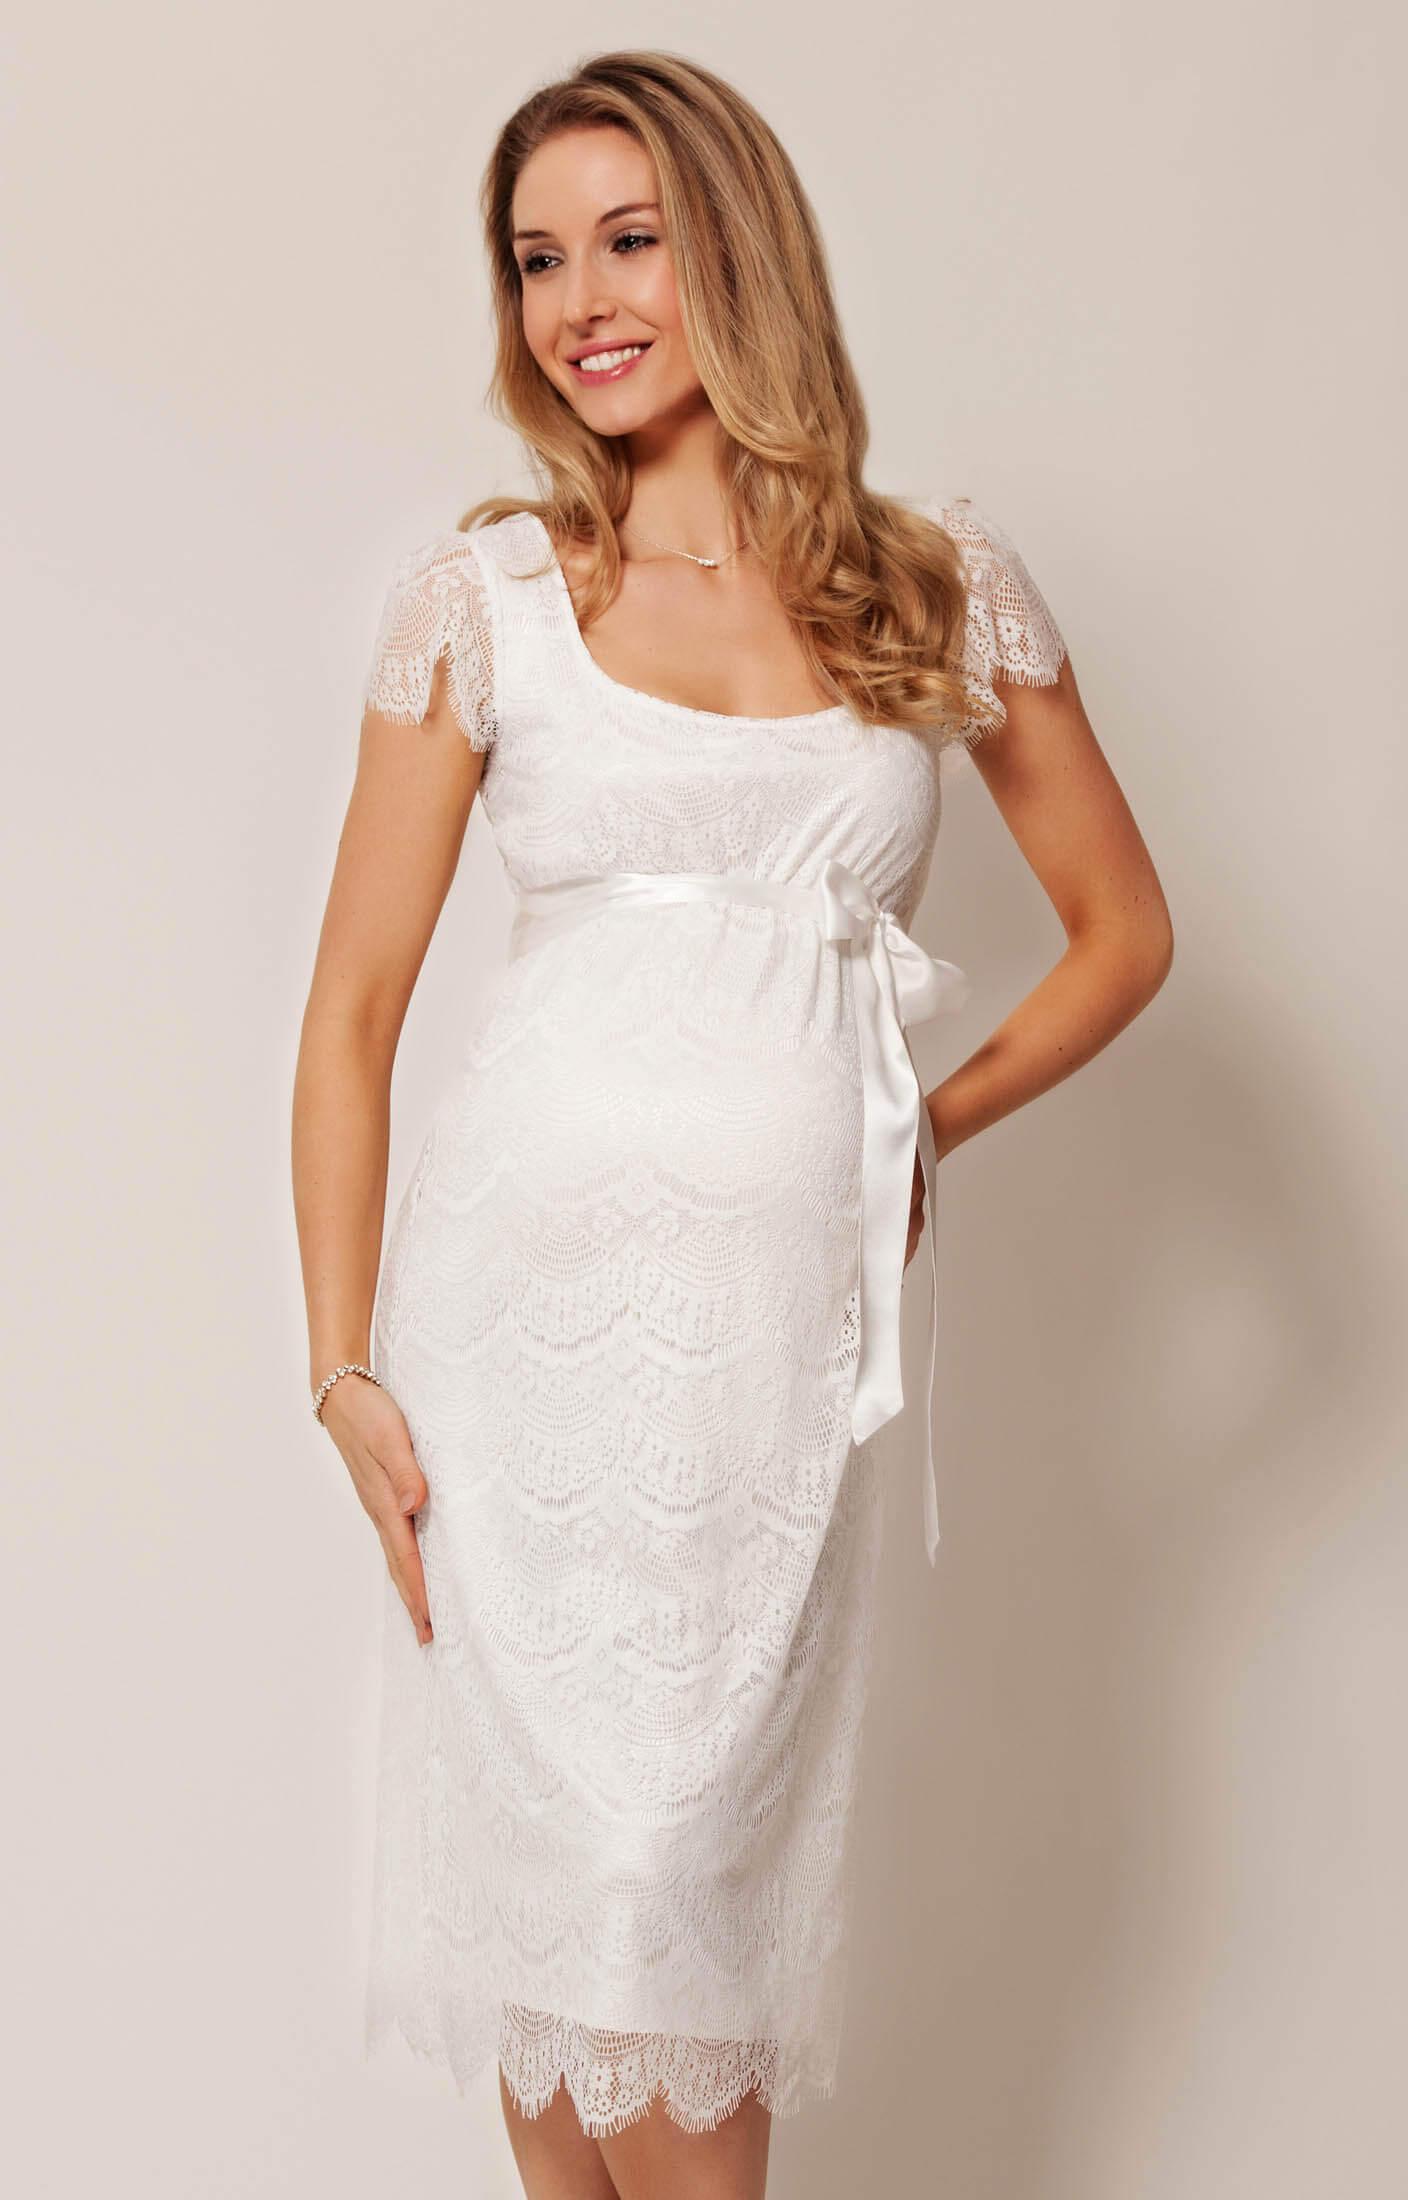 Flutter Maternity Dress Ivory maternity dresses for wedding Flutter Maternity Dress Ivory by Tiffany Rose